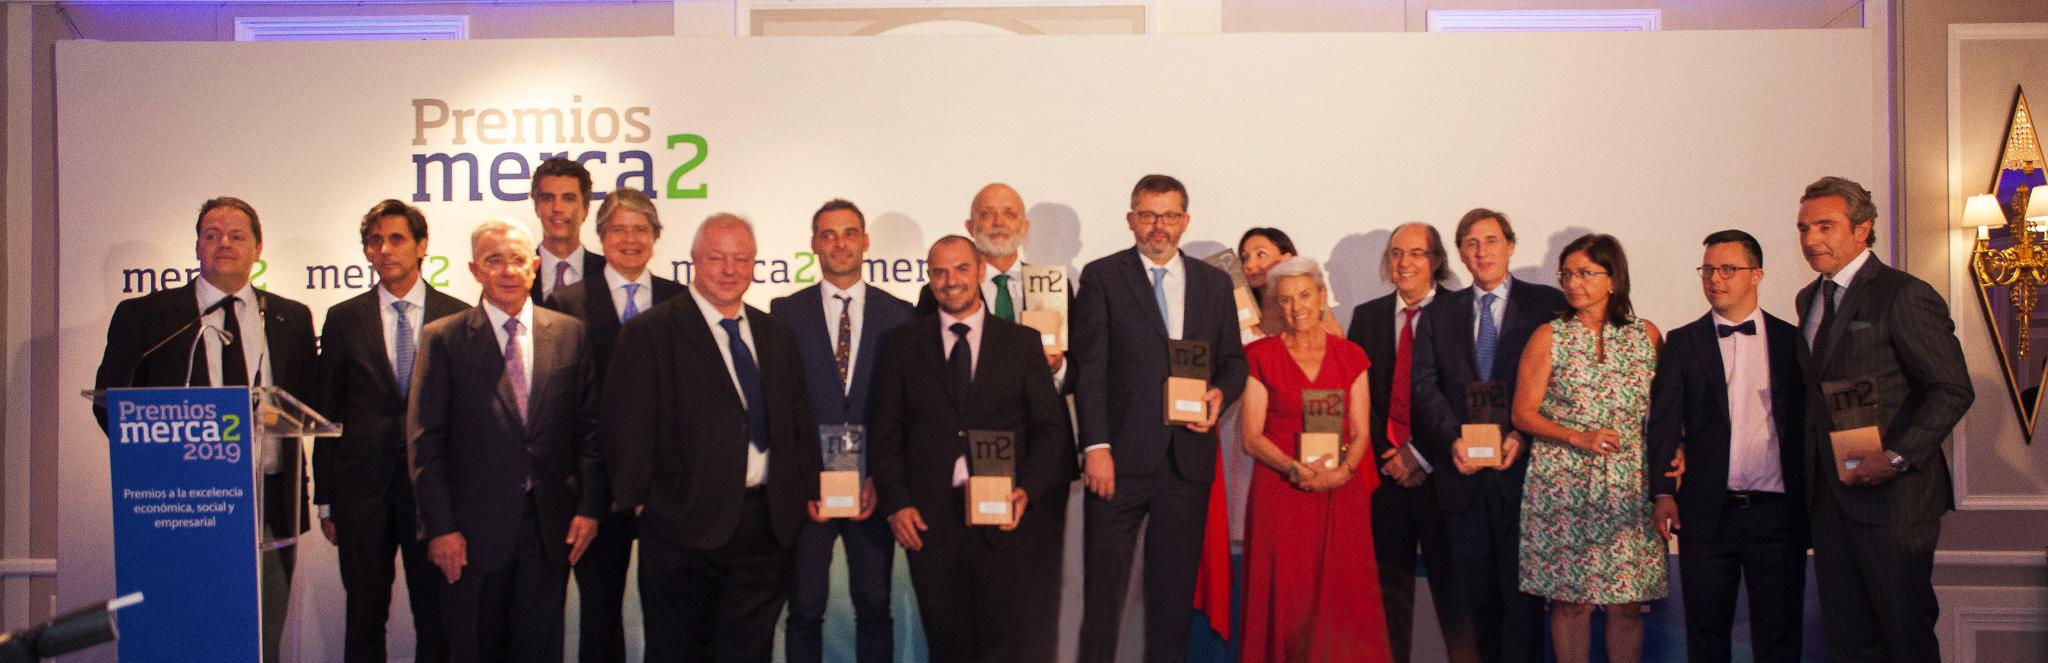 Premios-Merca2-2019-Espana